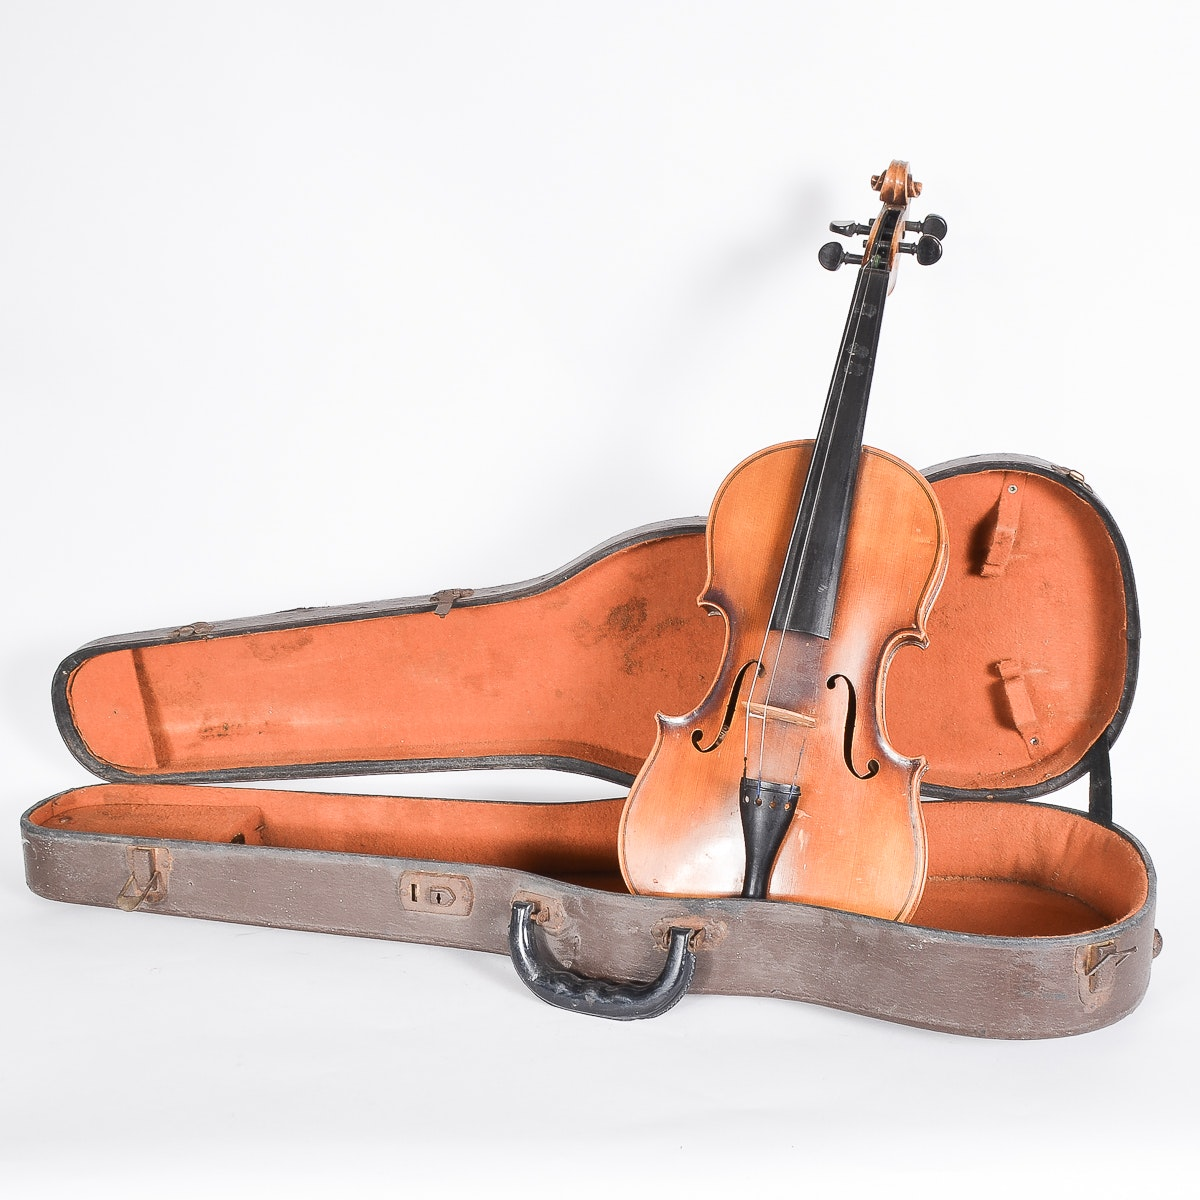 Vintage Lifton Violin